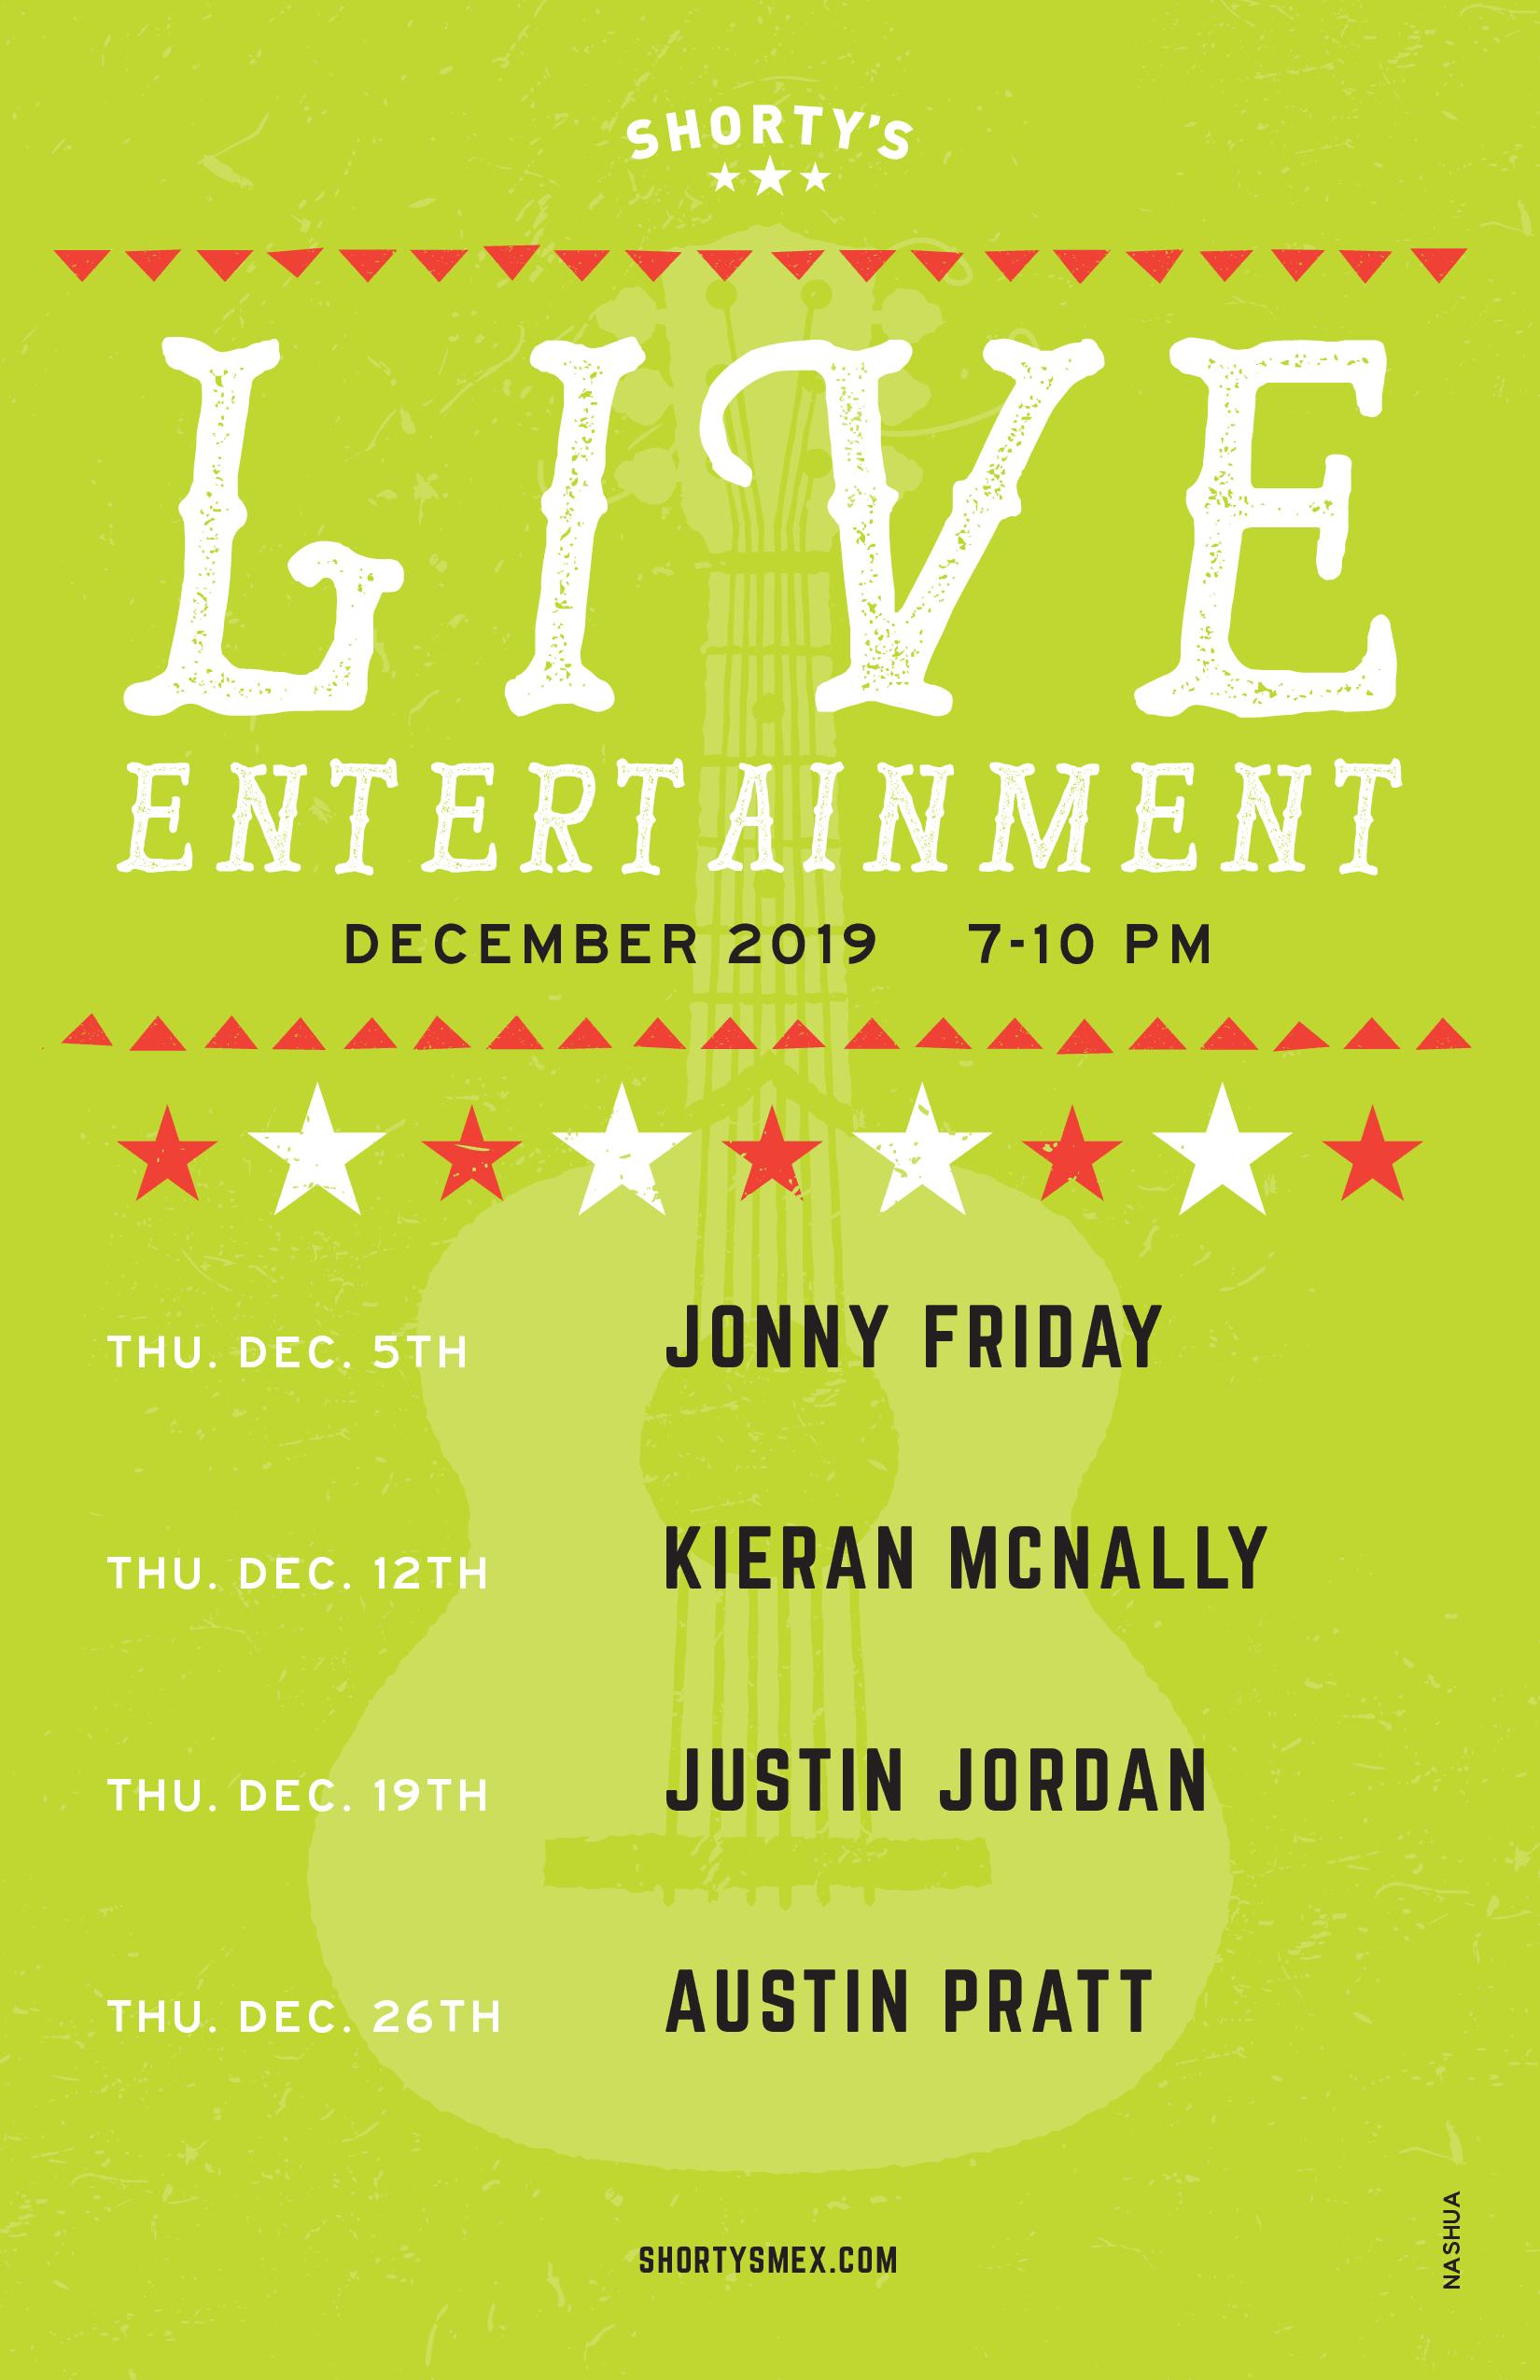 December Entertainment Schedule for Shorty's Nashua